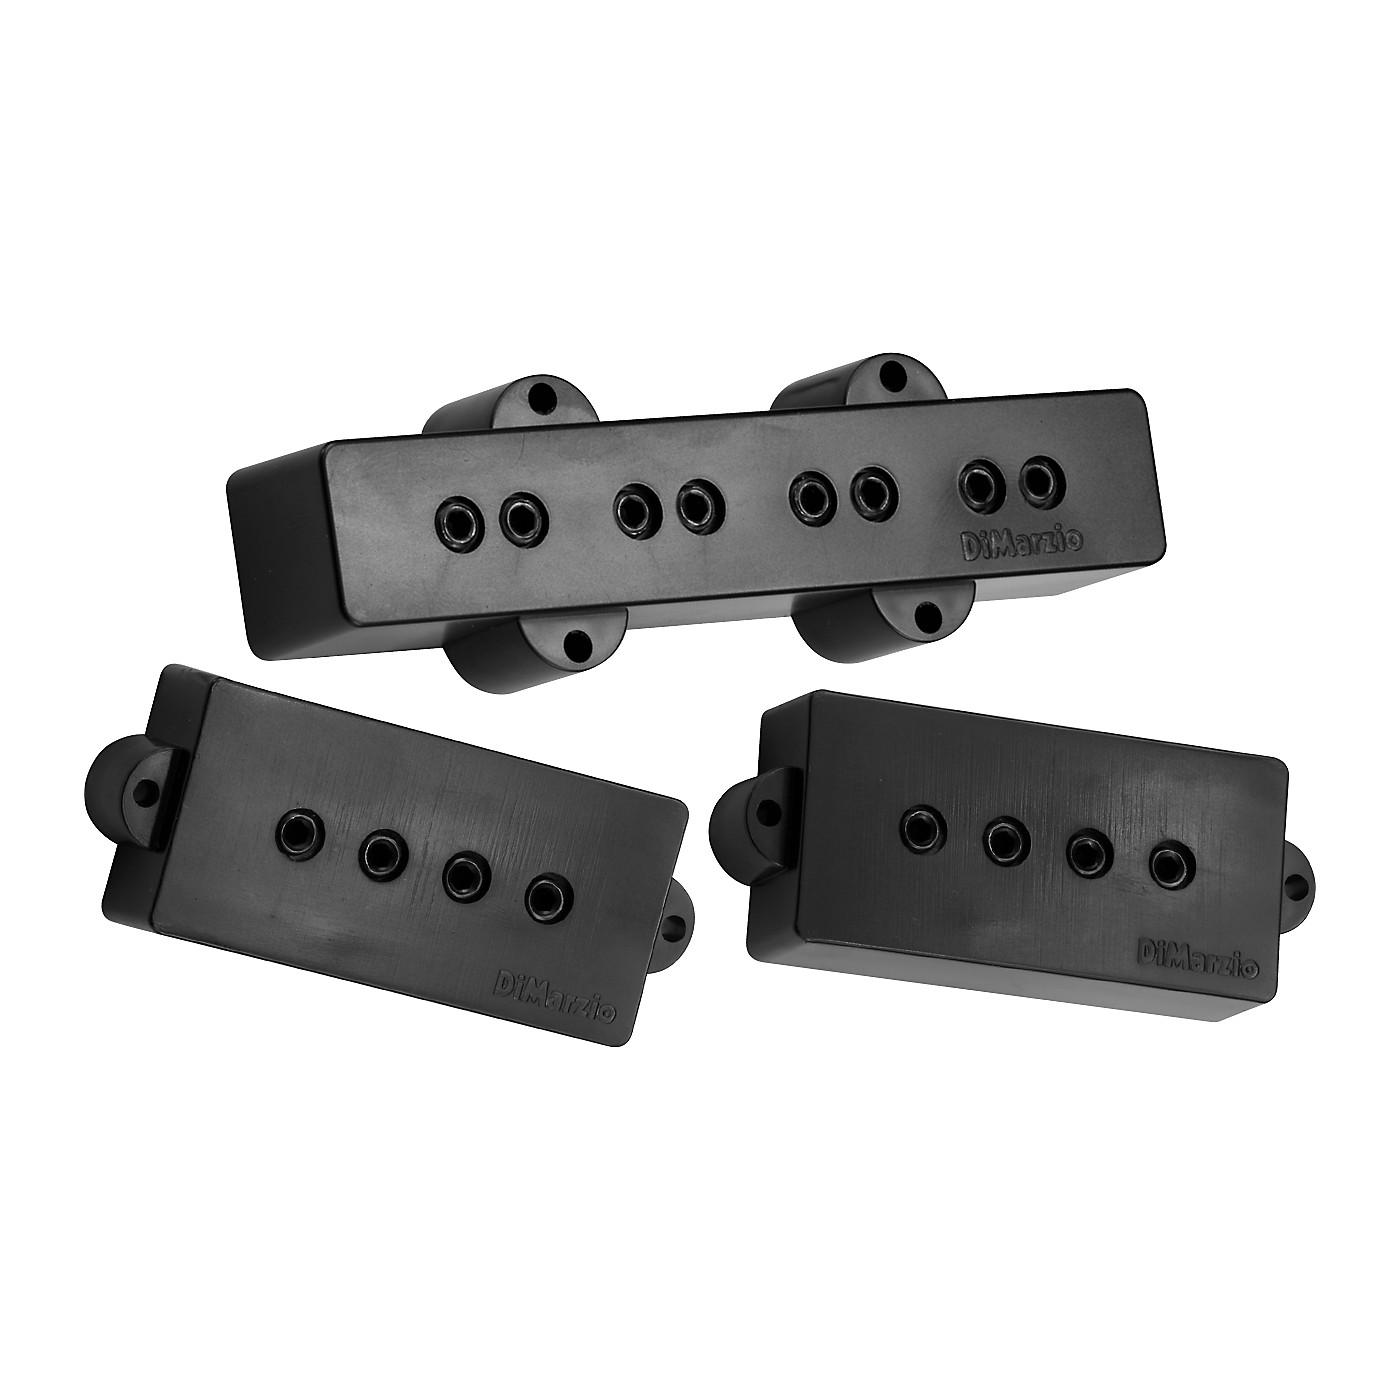 DiMarzio DP126 P+J Neck and Bridge Bass Pickup Set thumbnail